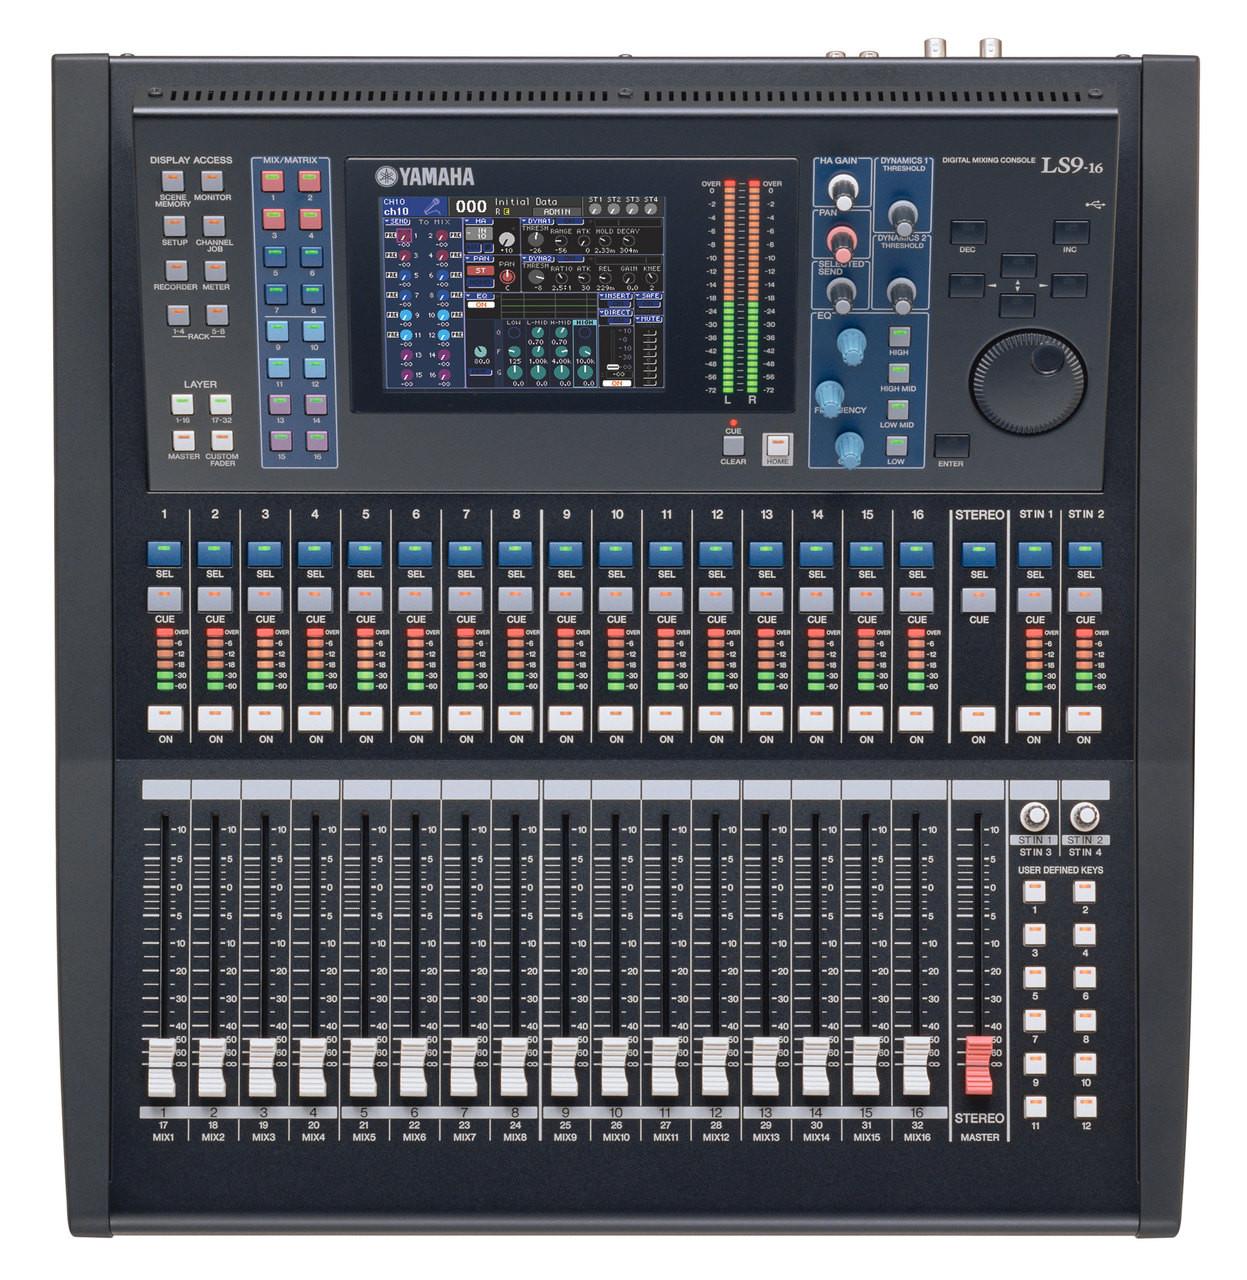 yamaha ls9 16 or 32 channel digital mixing console sound rh pnta com LS9 Toy yamaha ls9 16 manuale italiano